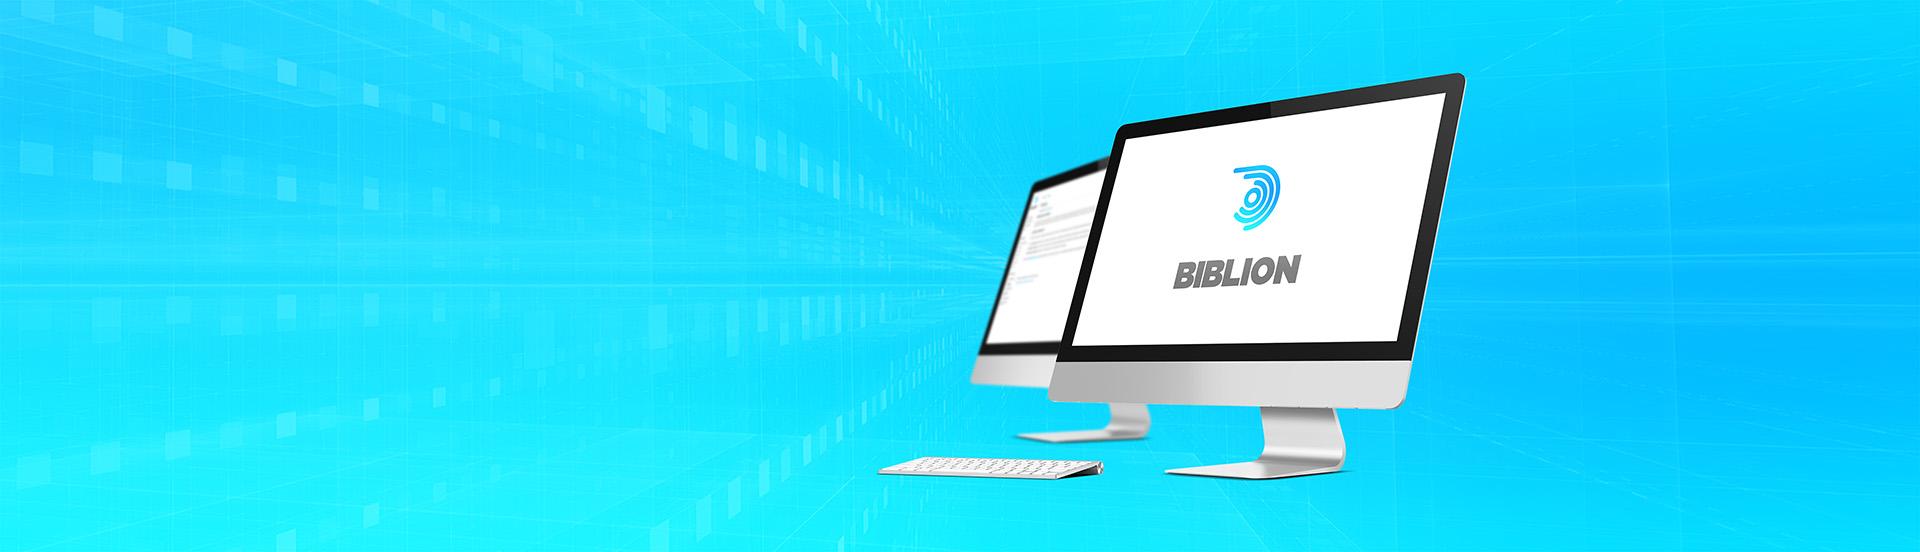 biblion_slide3